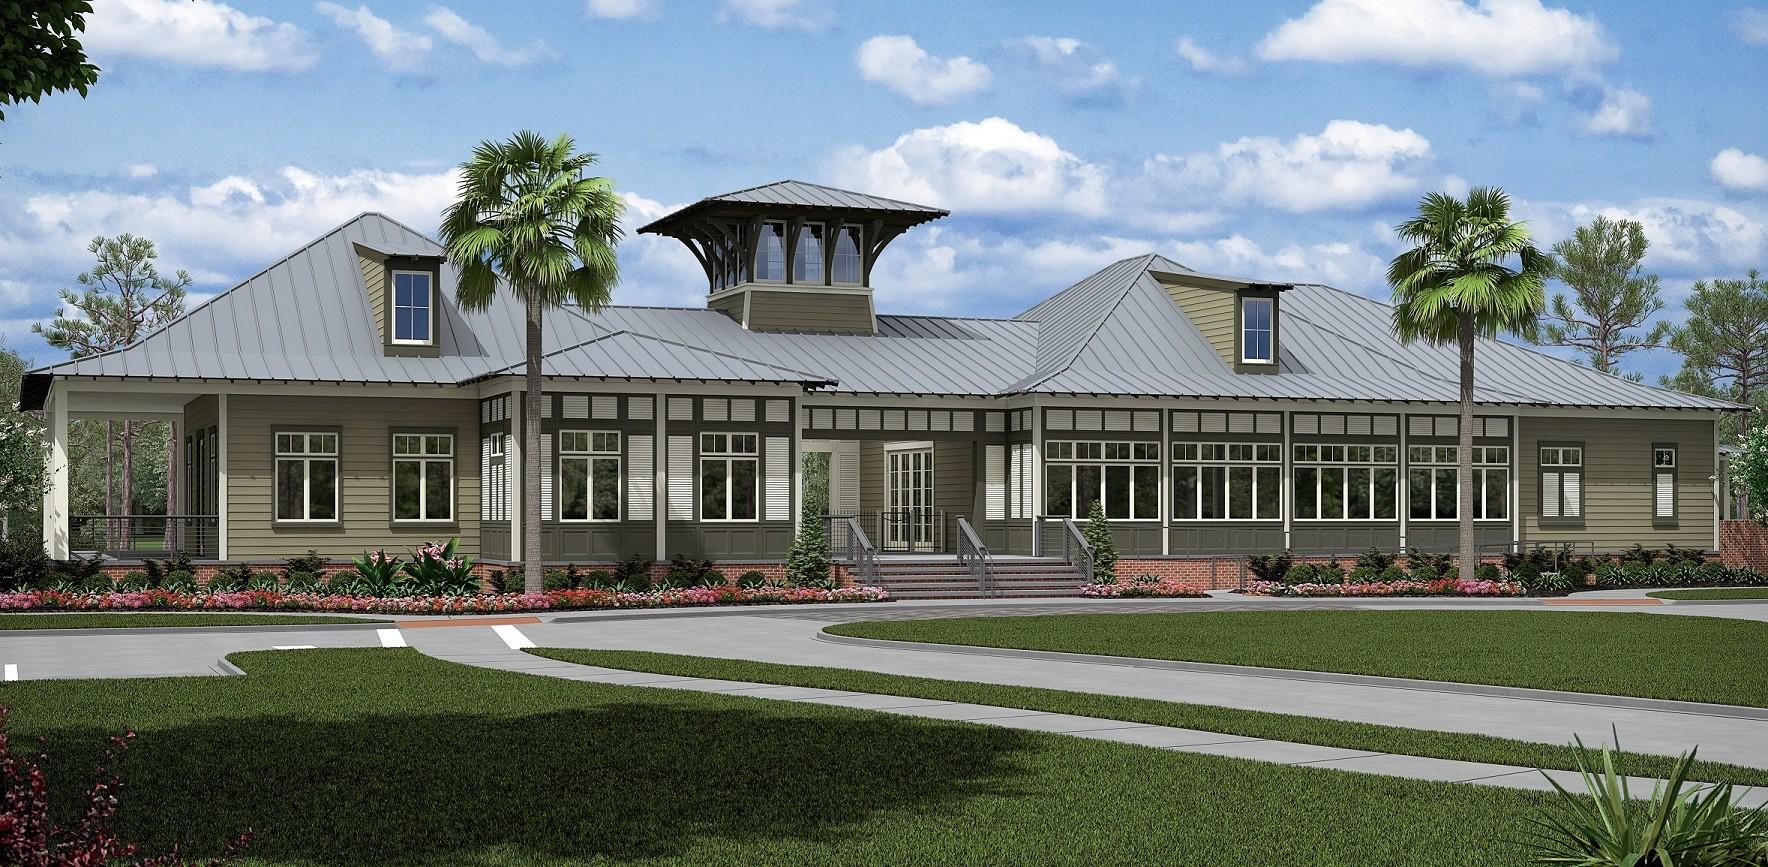 Mattamy homes rivertown celebrates amenity center for Mattamy homes